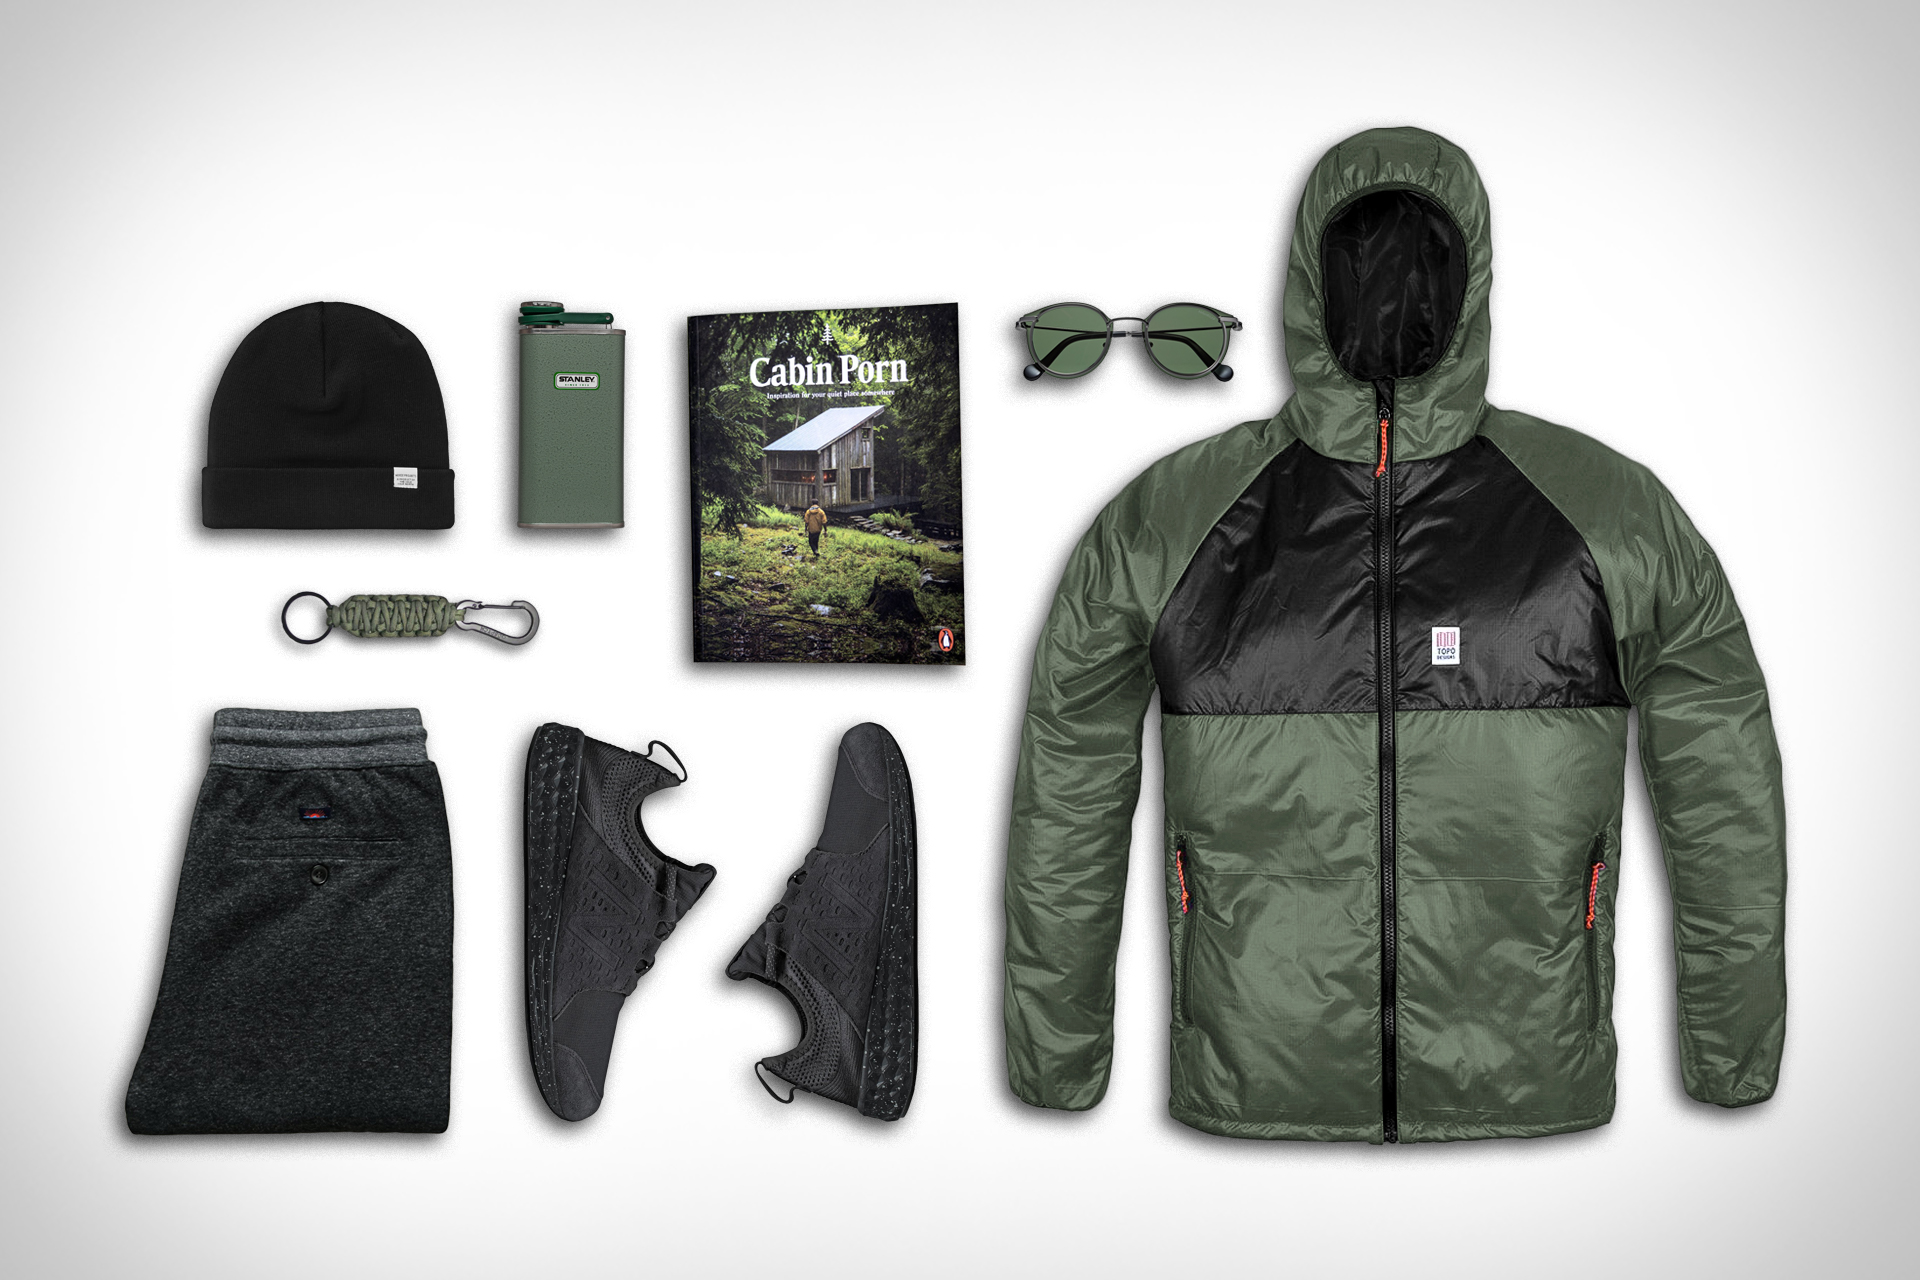 Garb: Forest